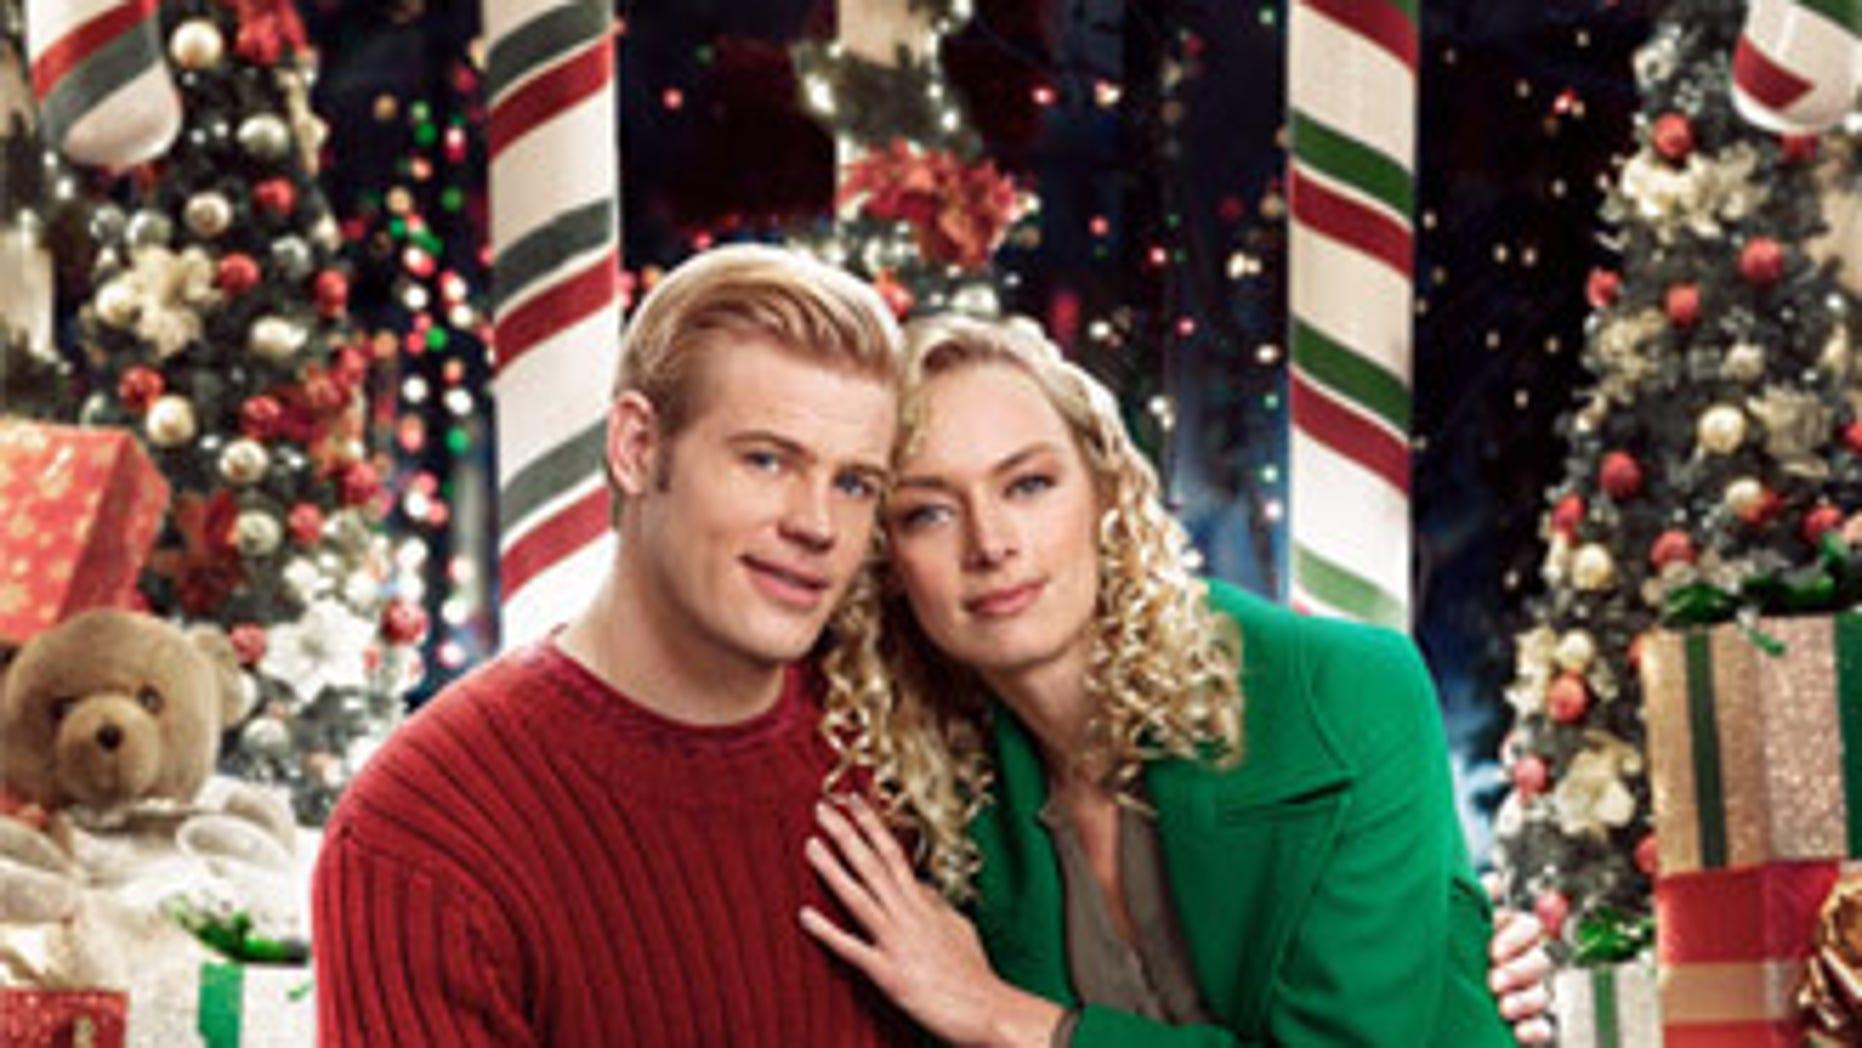 Hallmark Christmas Movies Under Fire For Spreading Caucasian Cheer